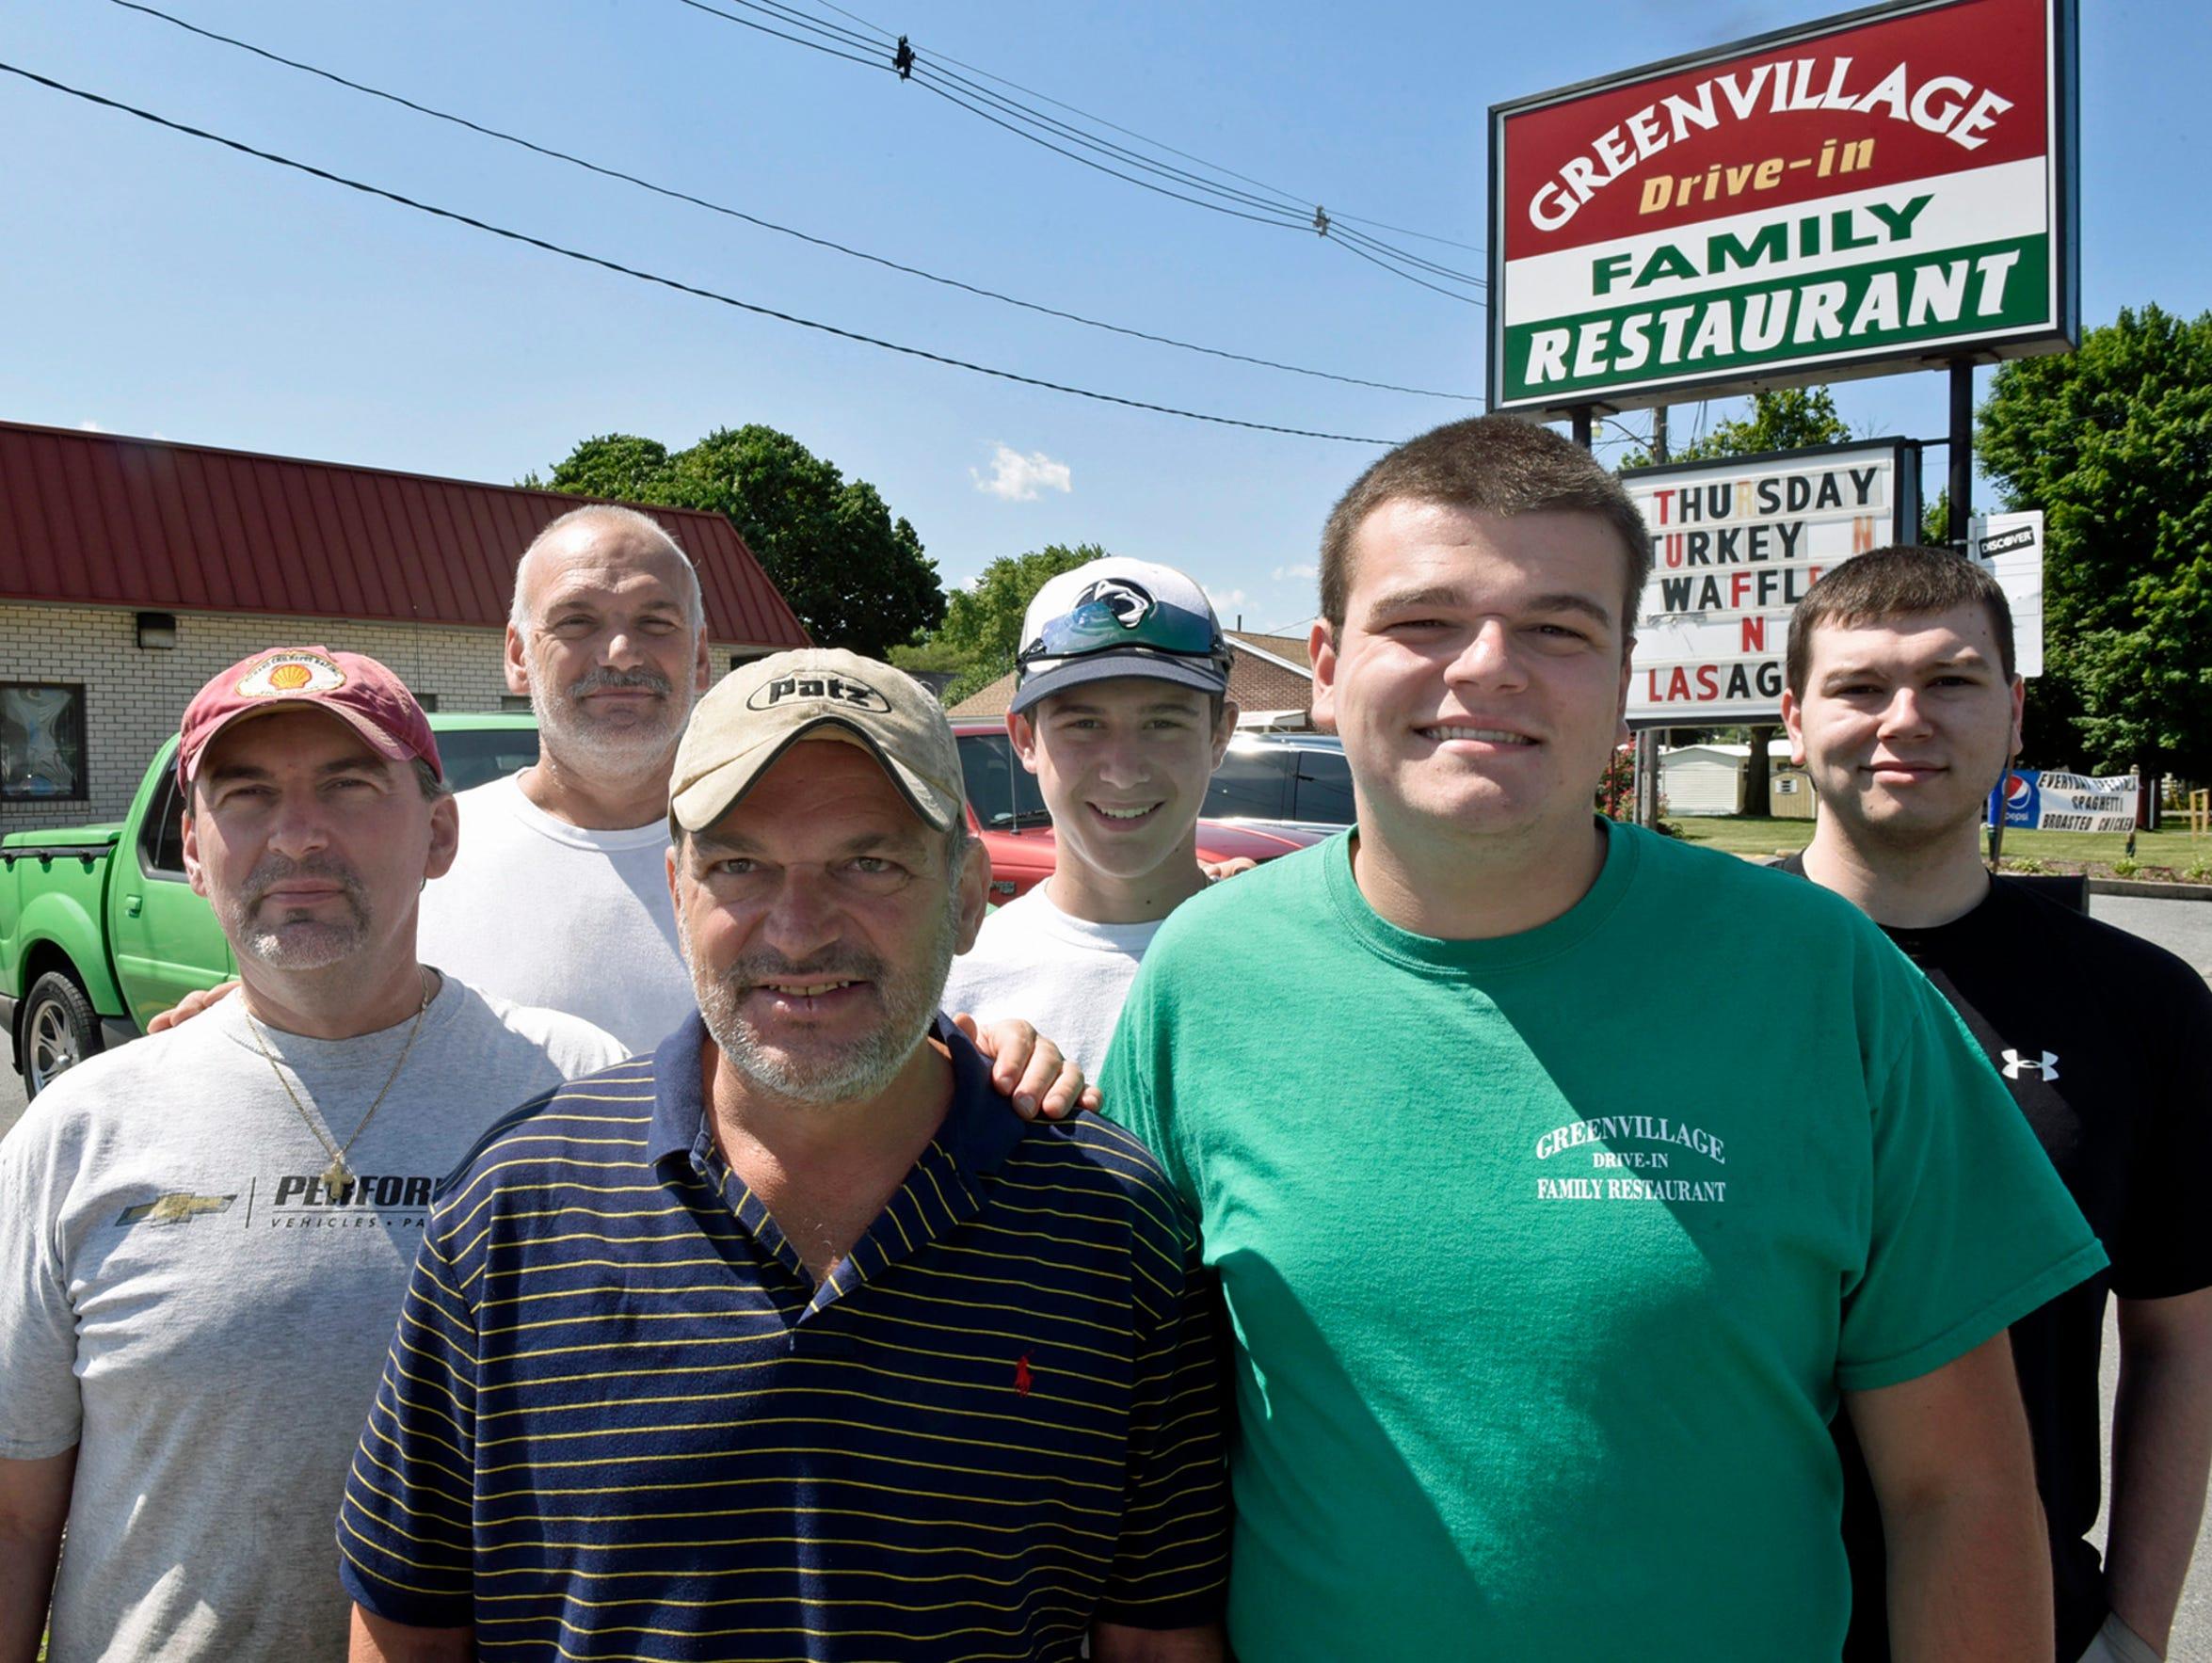 The Hronis' gather at Greenvillage Restuarant on Thursday